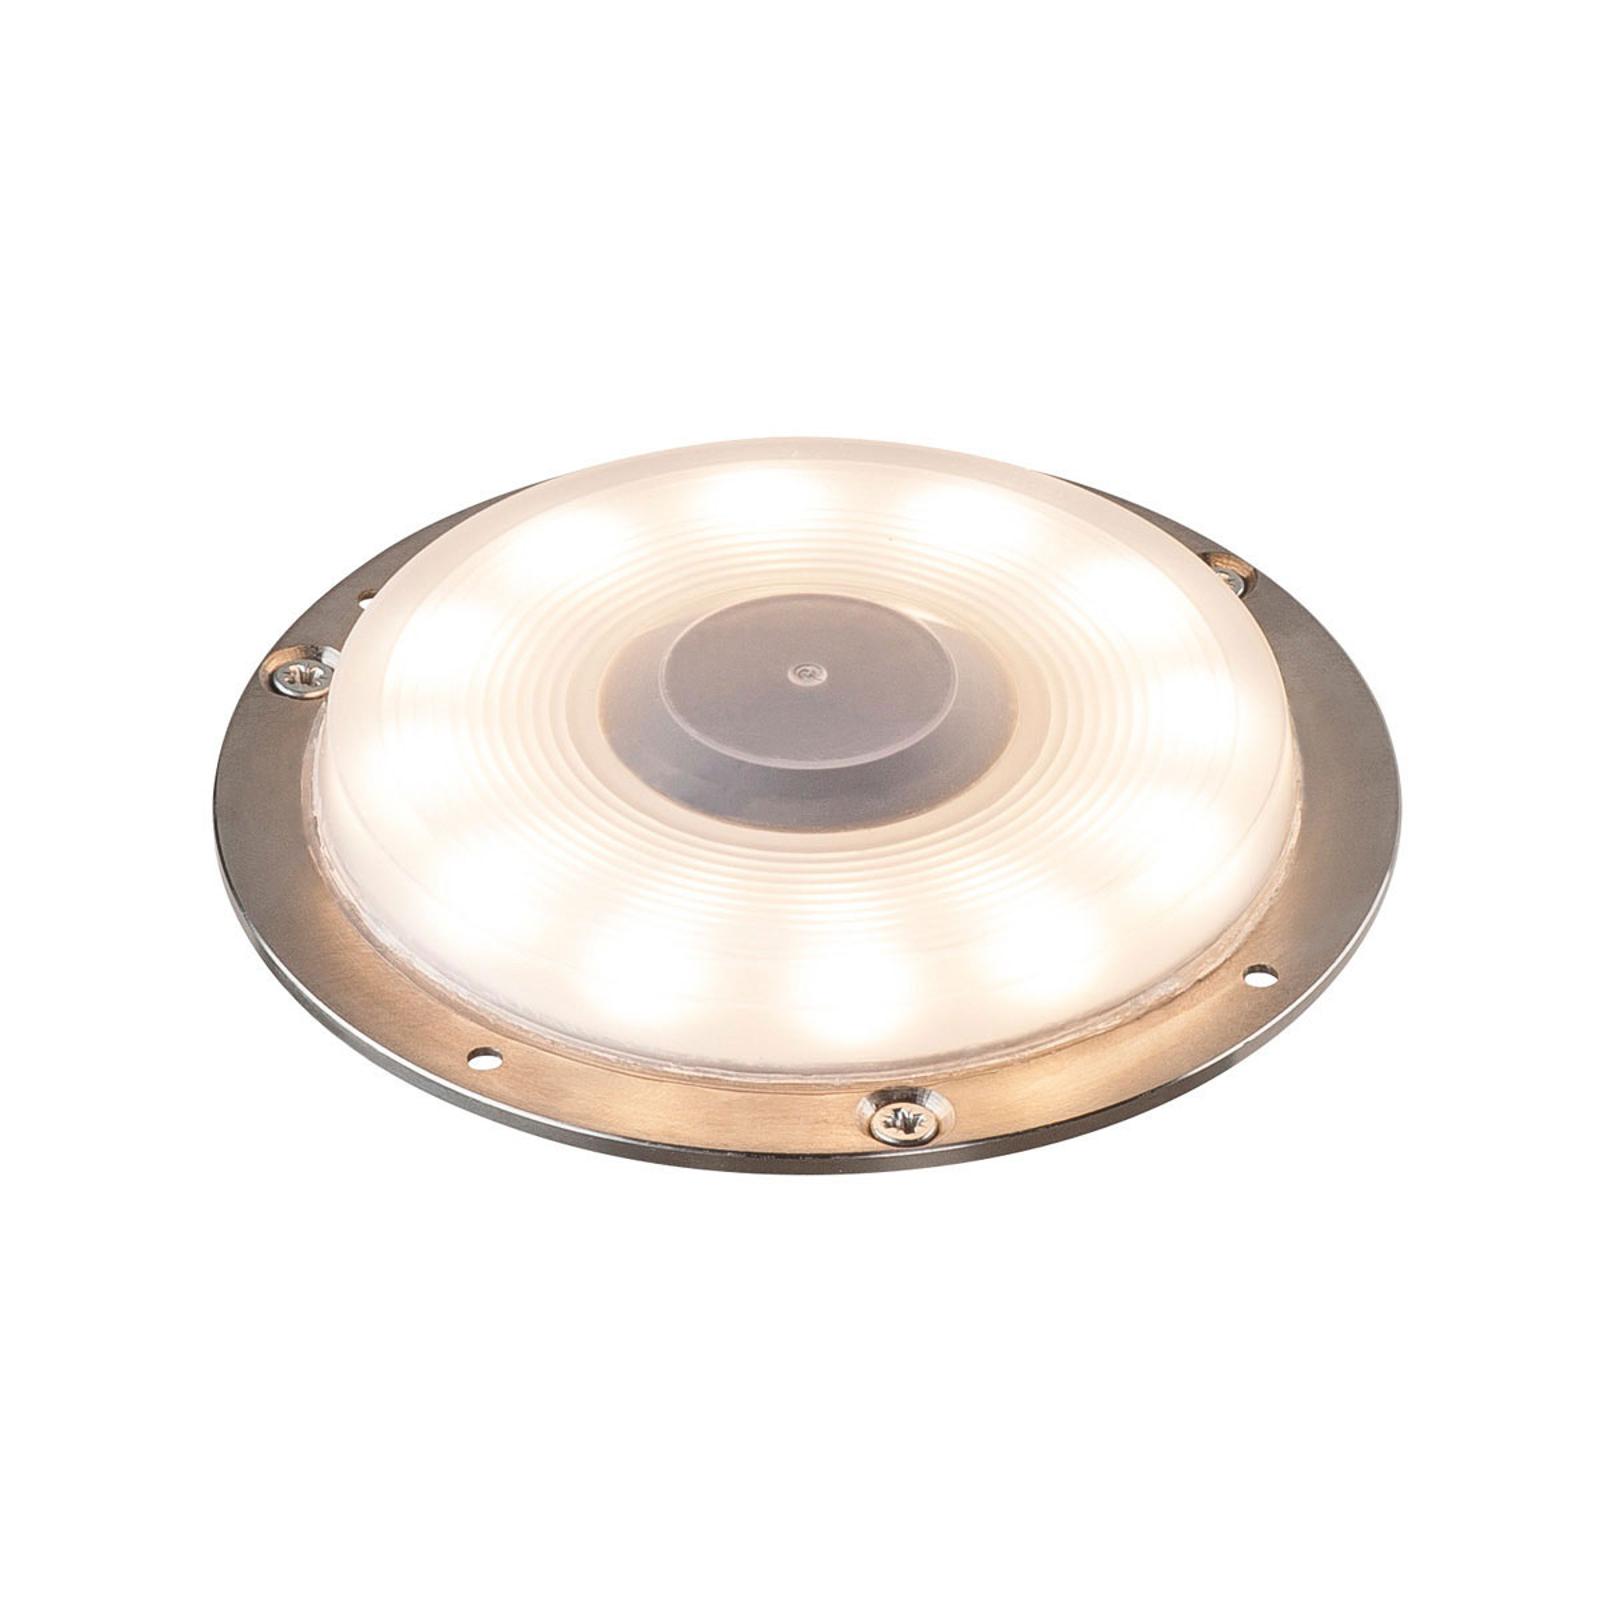 SLV Big Plot LED-Bodeneinbauleuchte Edelstahl